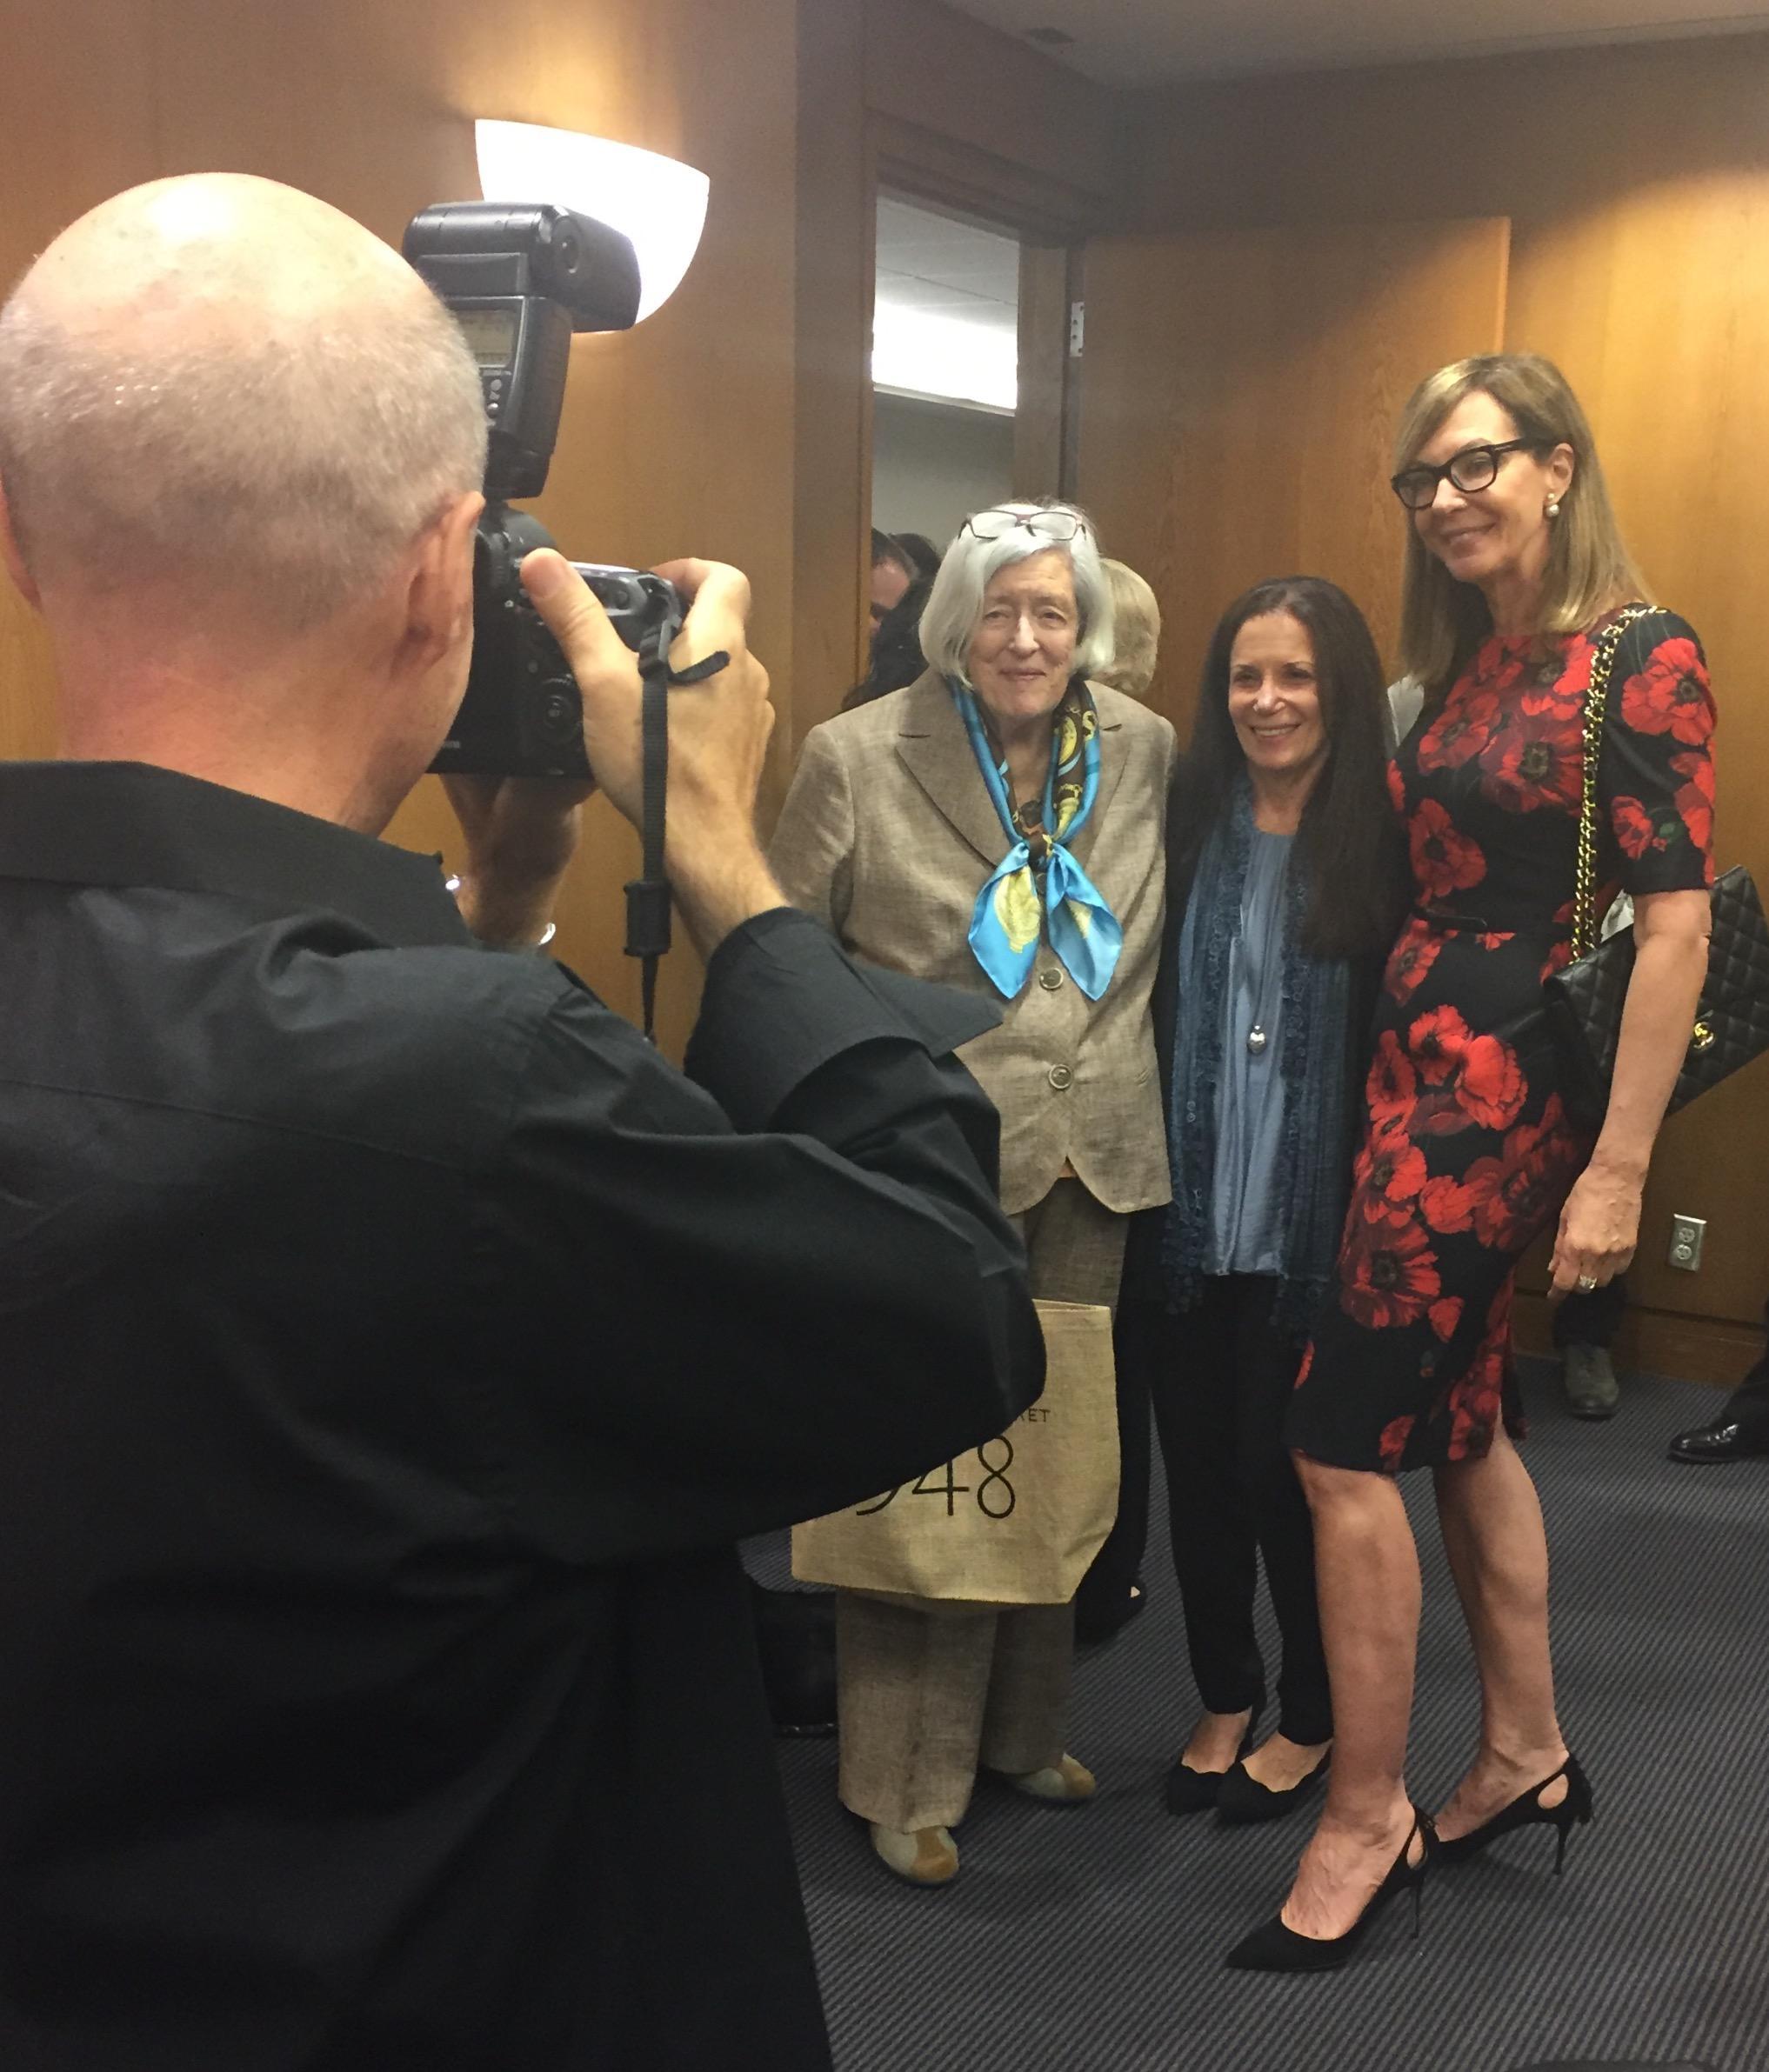 Allison Janney Pics allison janney among 2017 dayton regional walk of fame